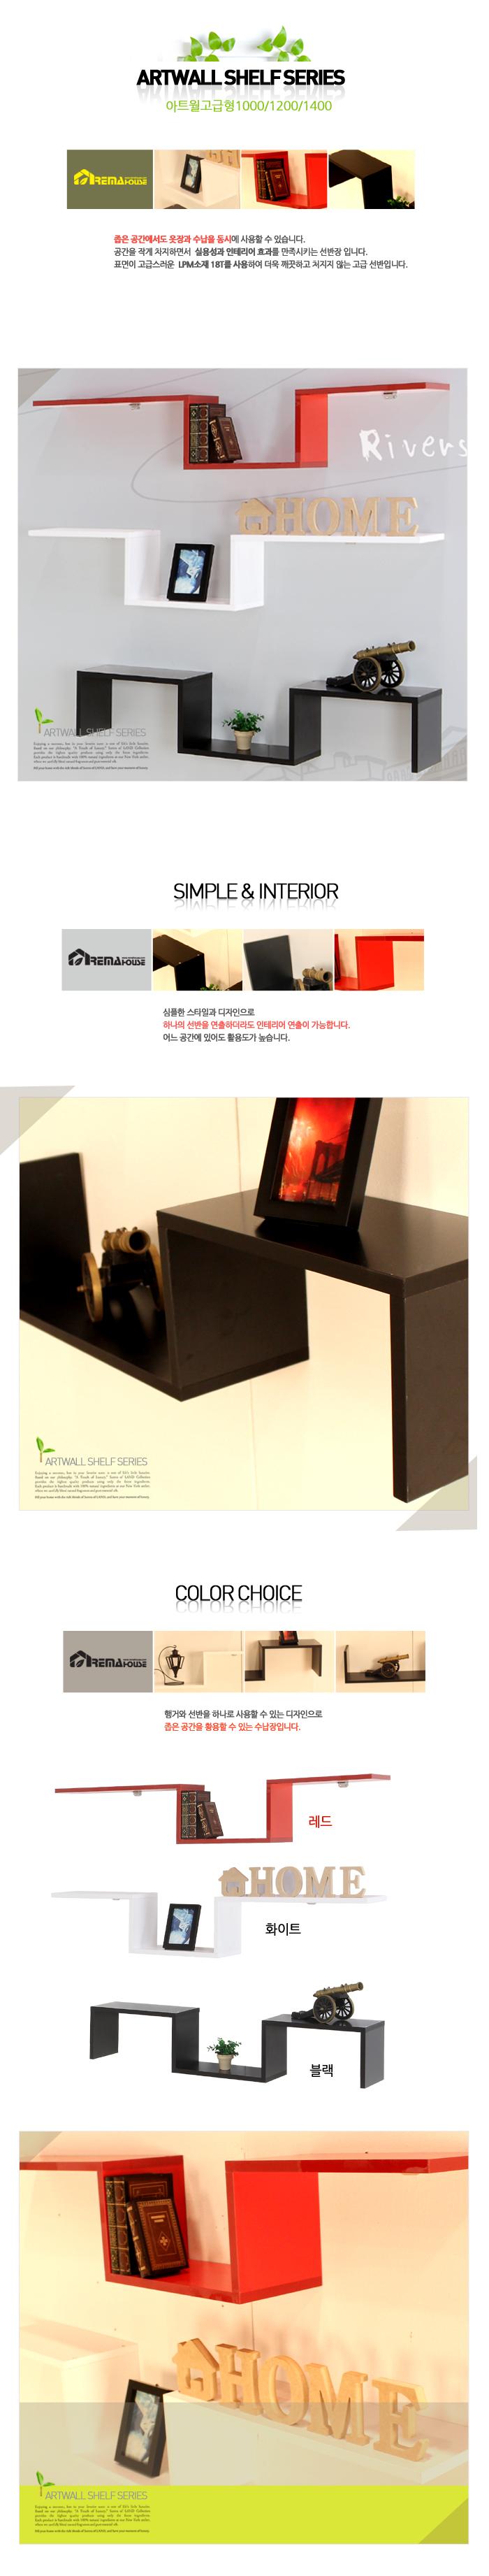 Artwall shelf series for Household product design